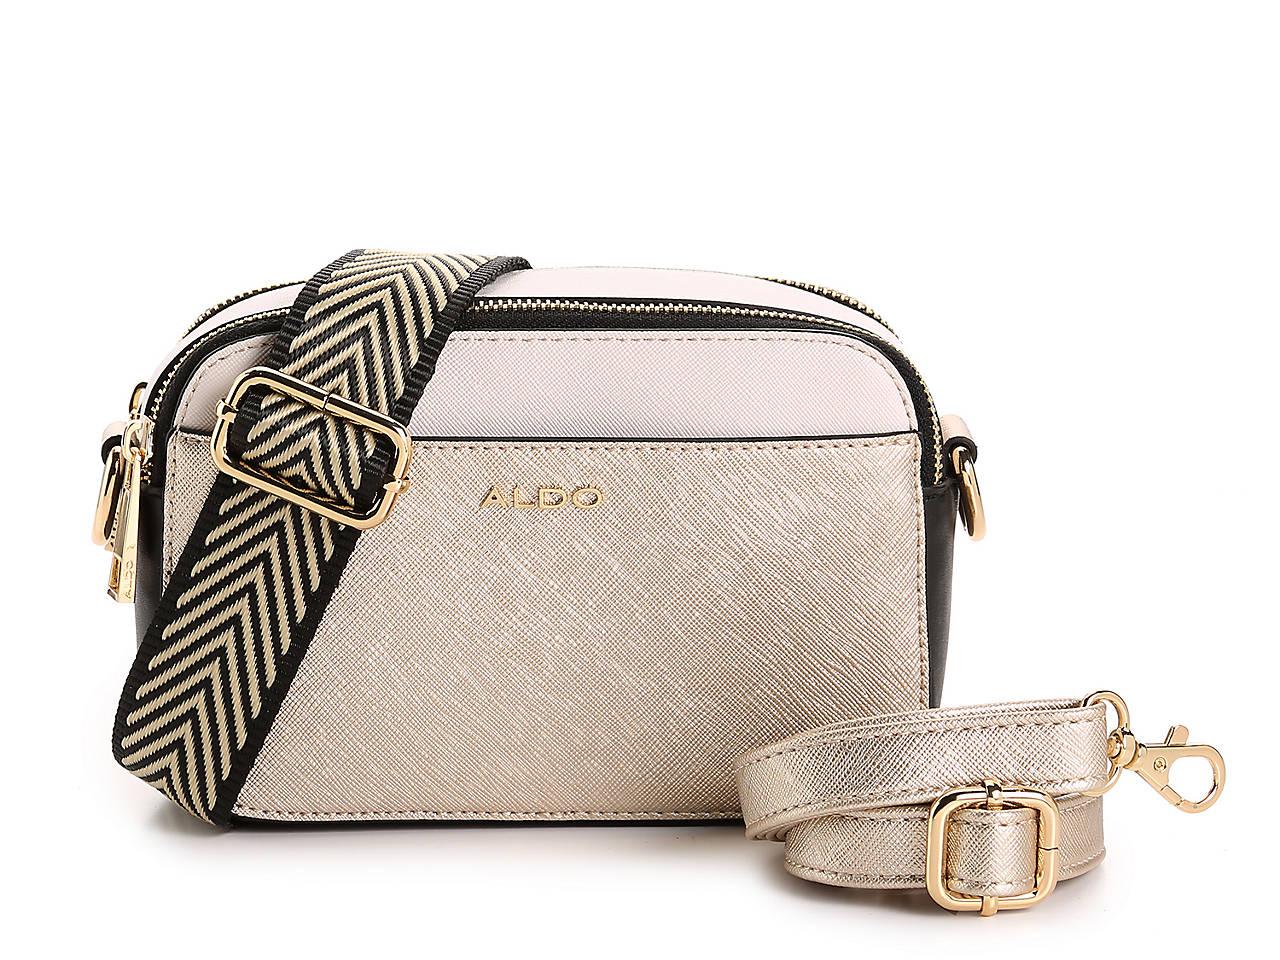 98648fb9c76 Aldo Ridout Crossbody Bag Women's Handbags & Accessories | DSW